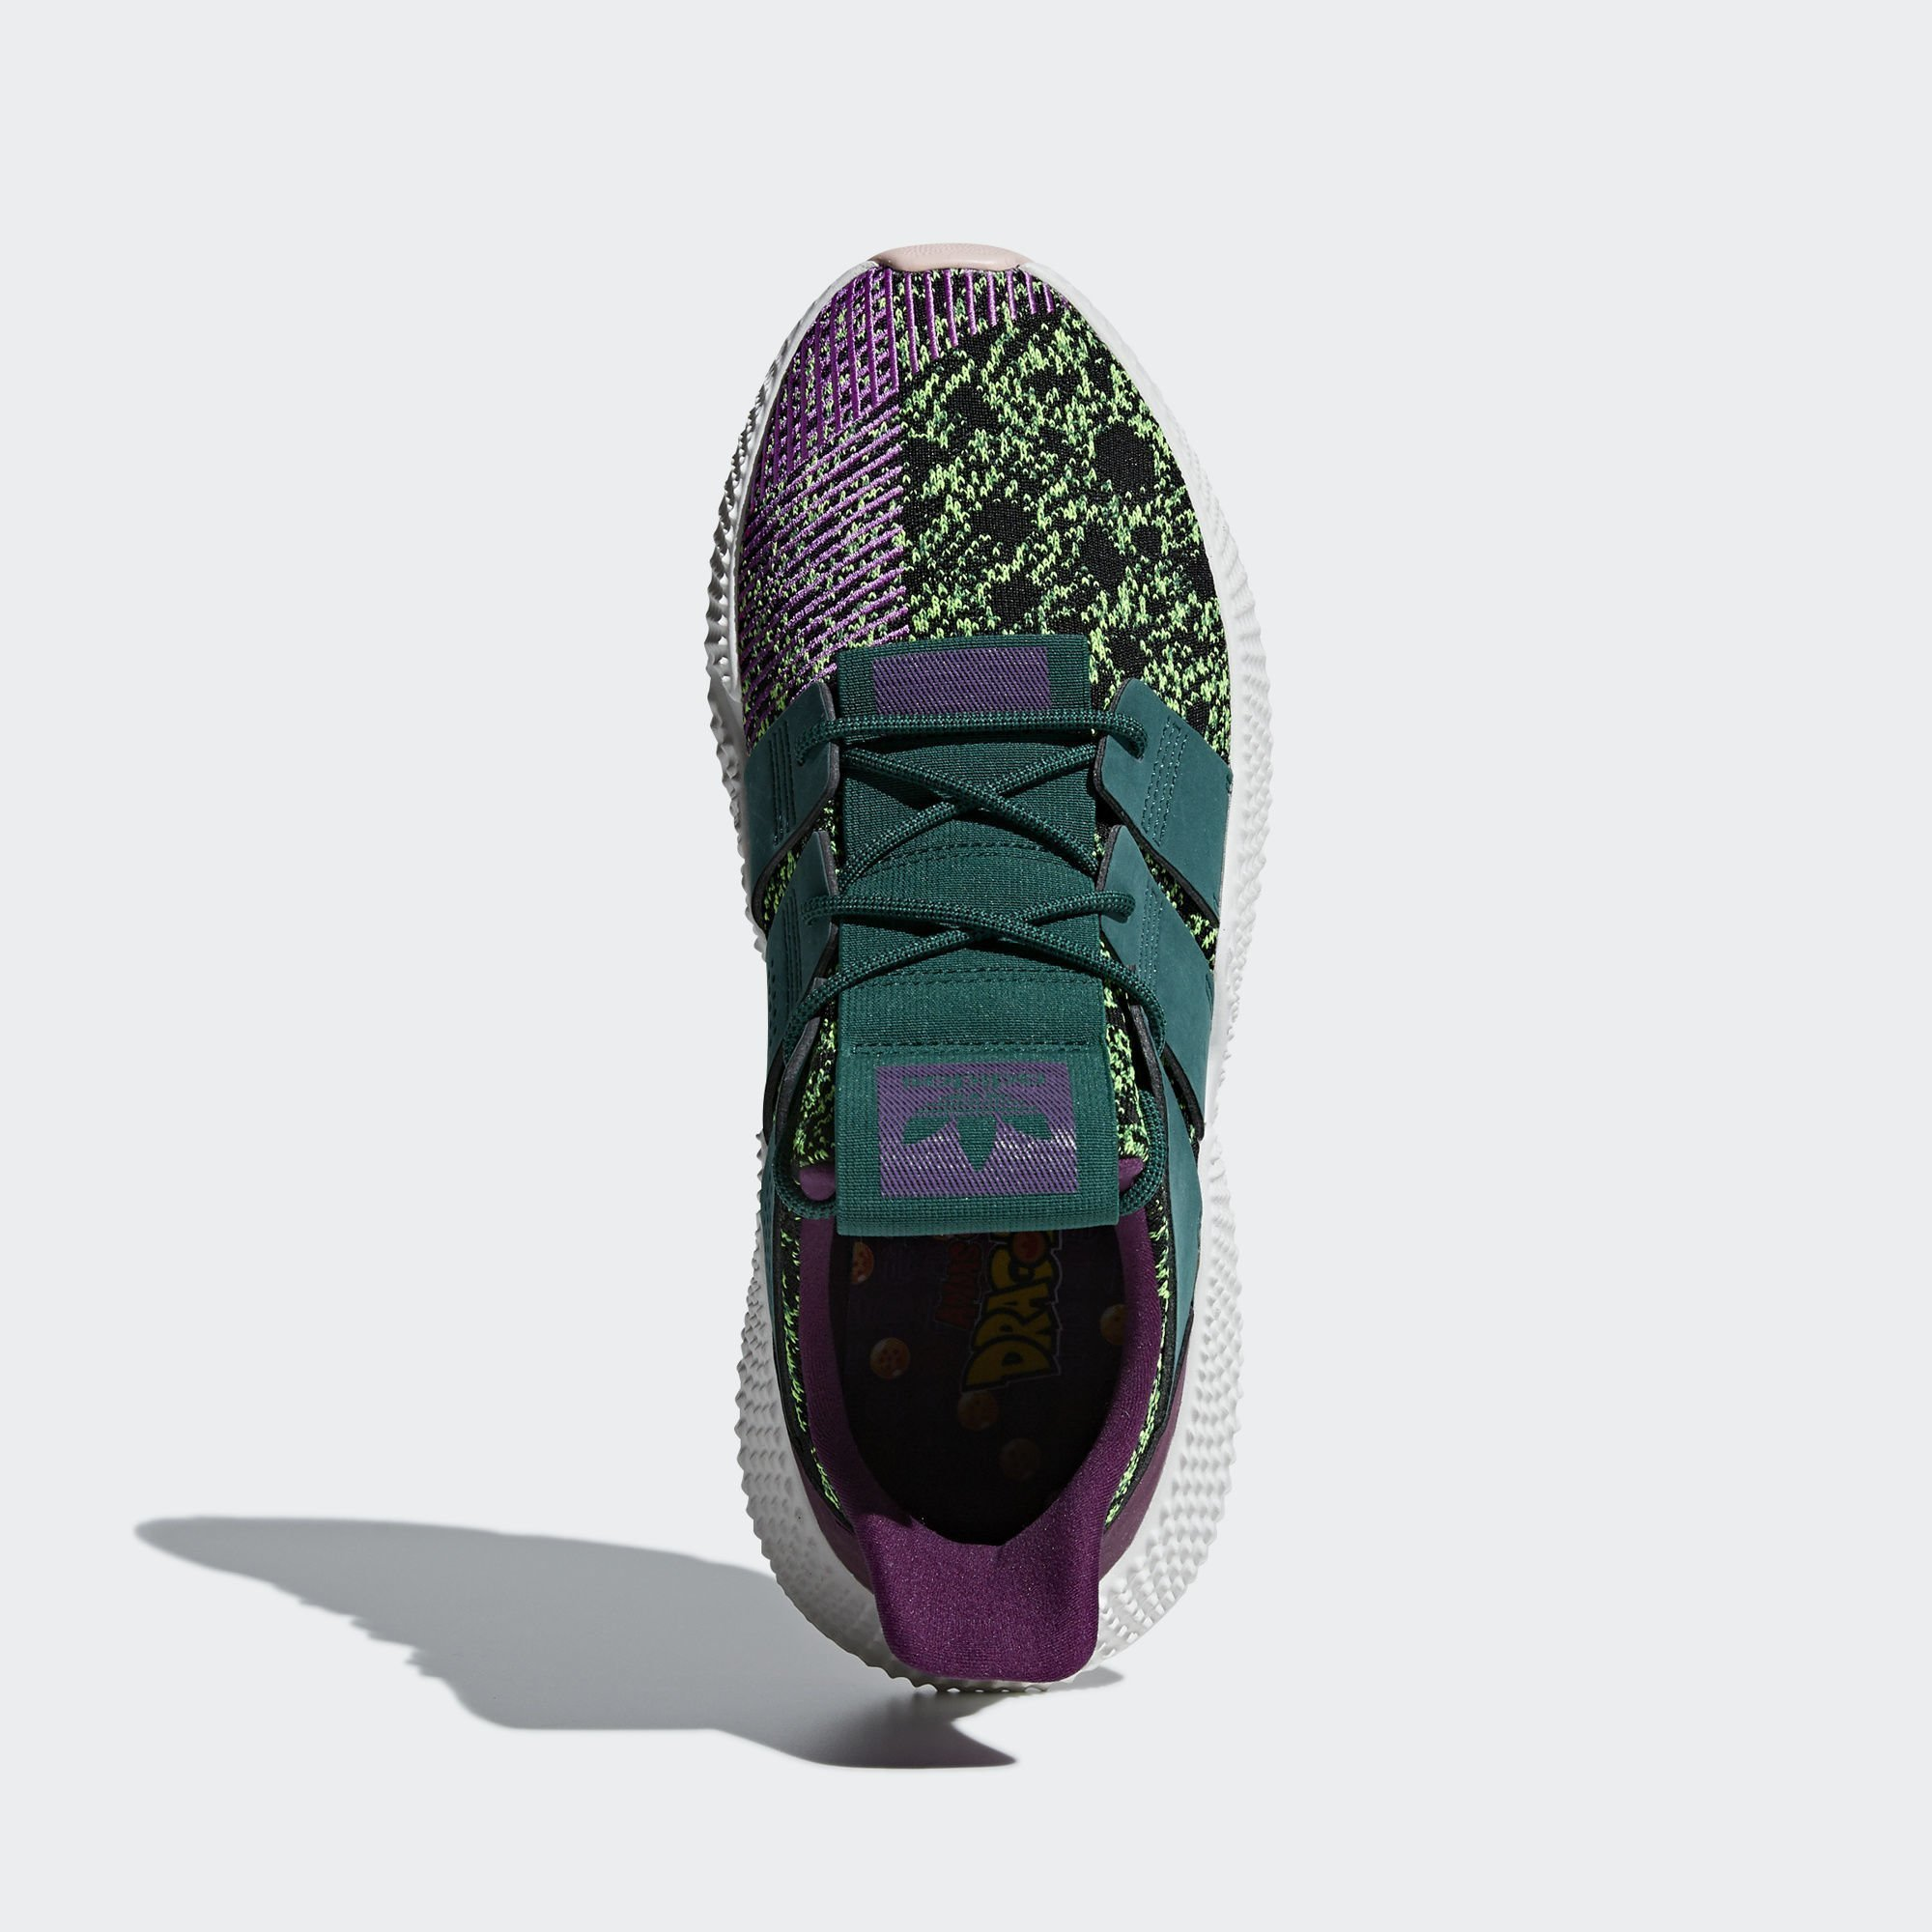 Dragon ball Z X adidas 'Cell' (D97053)